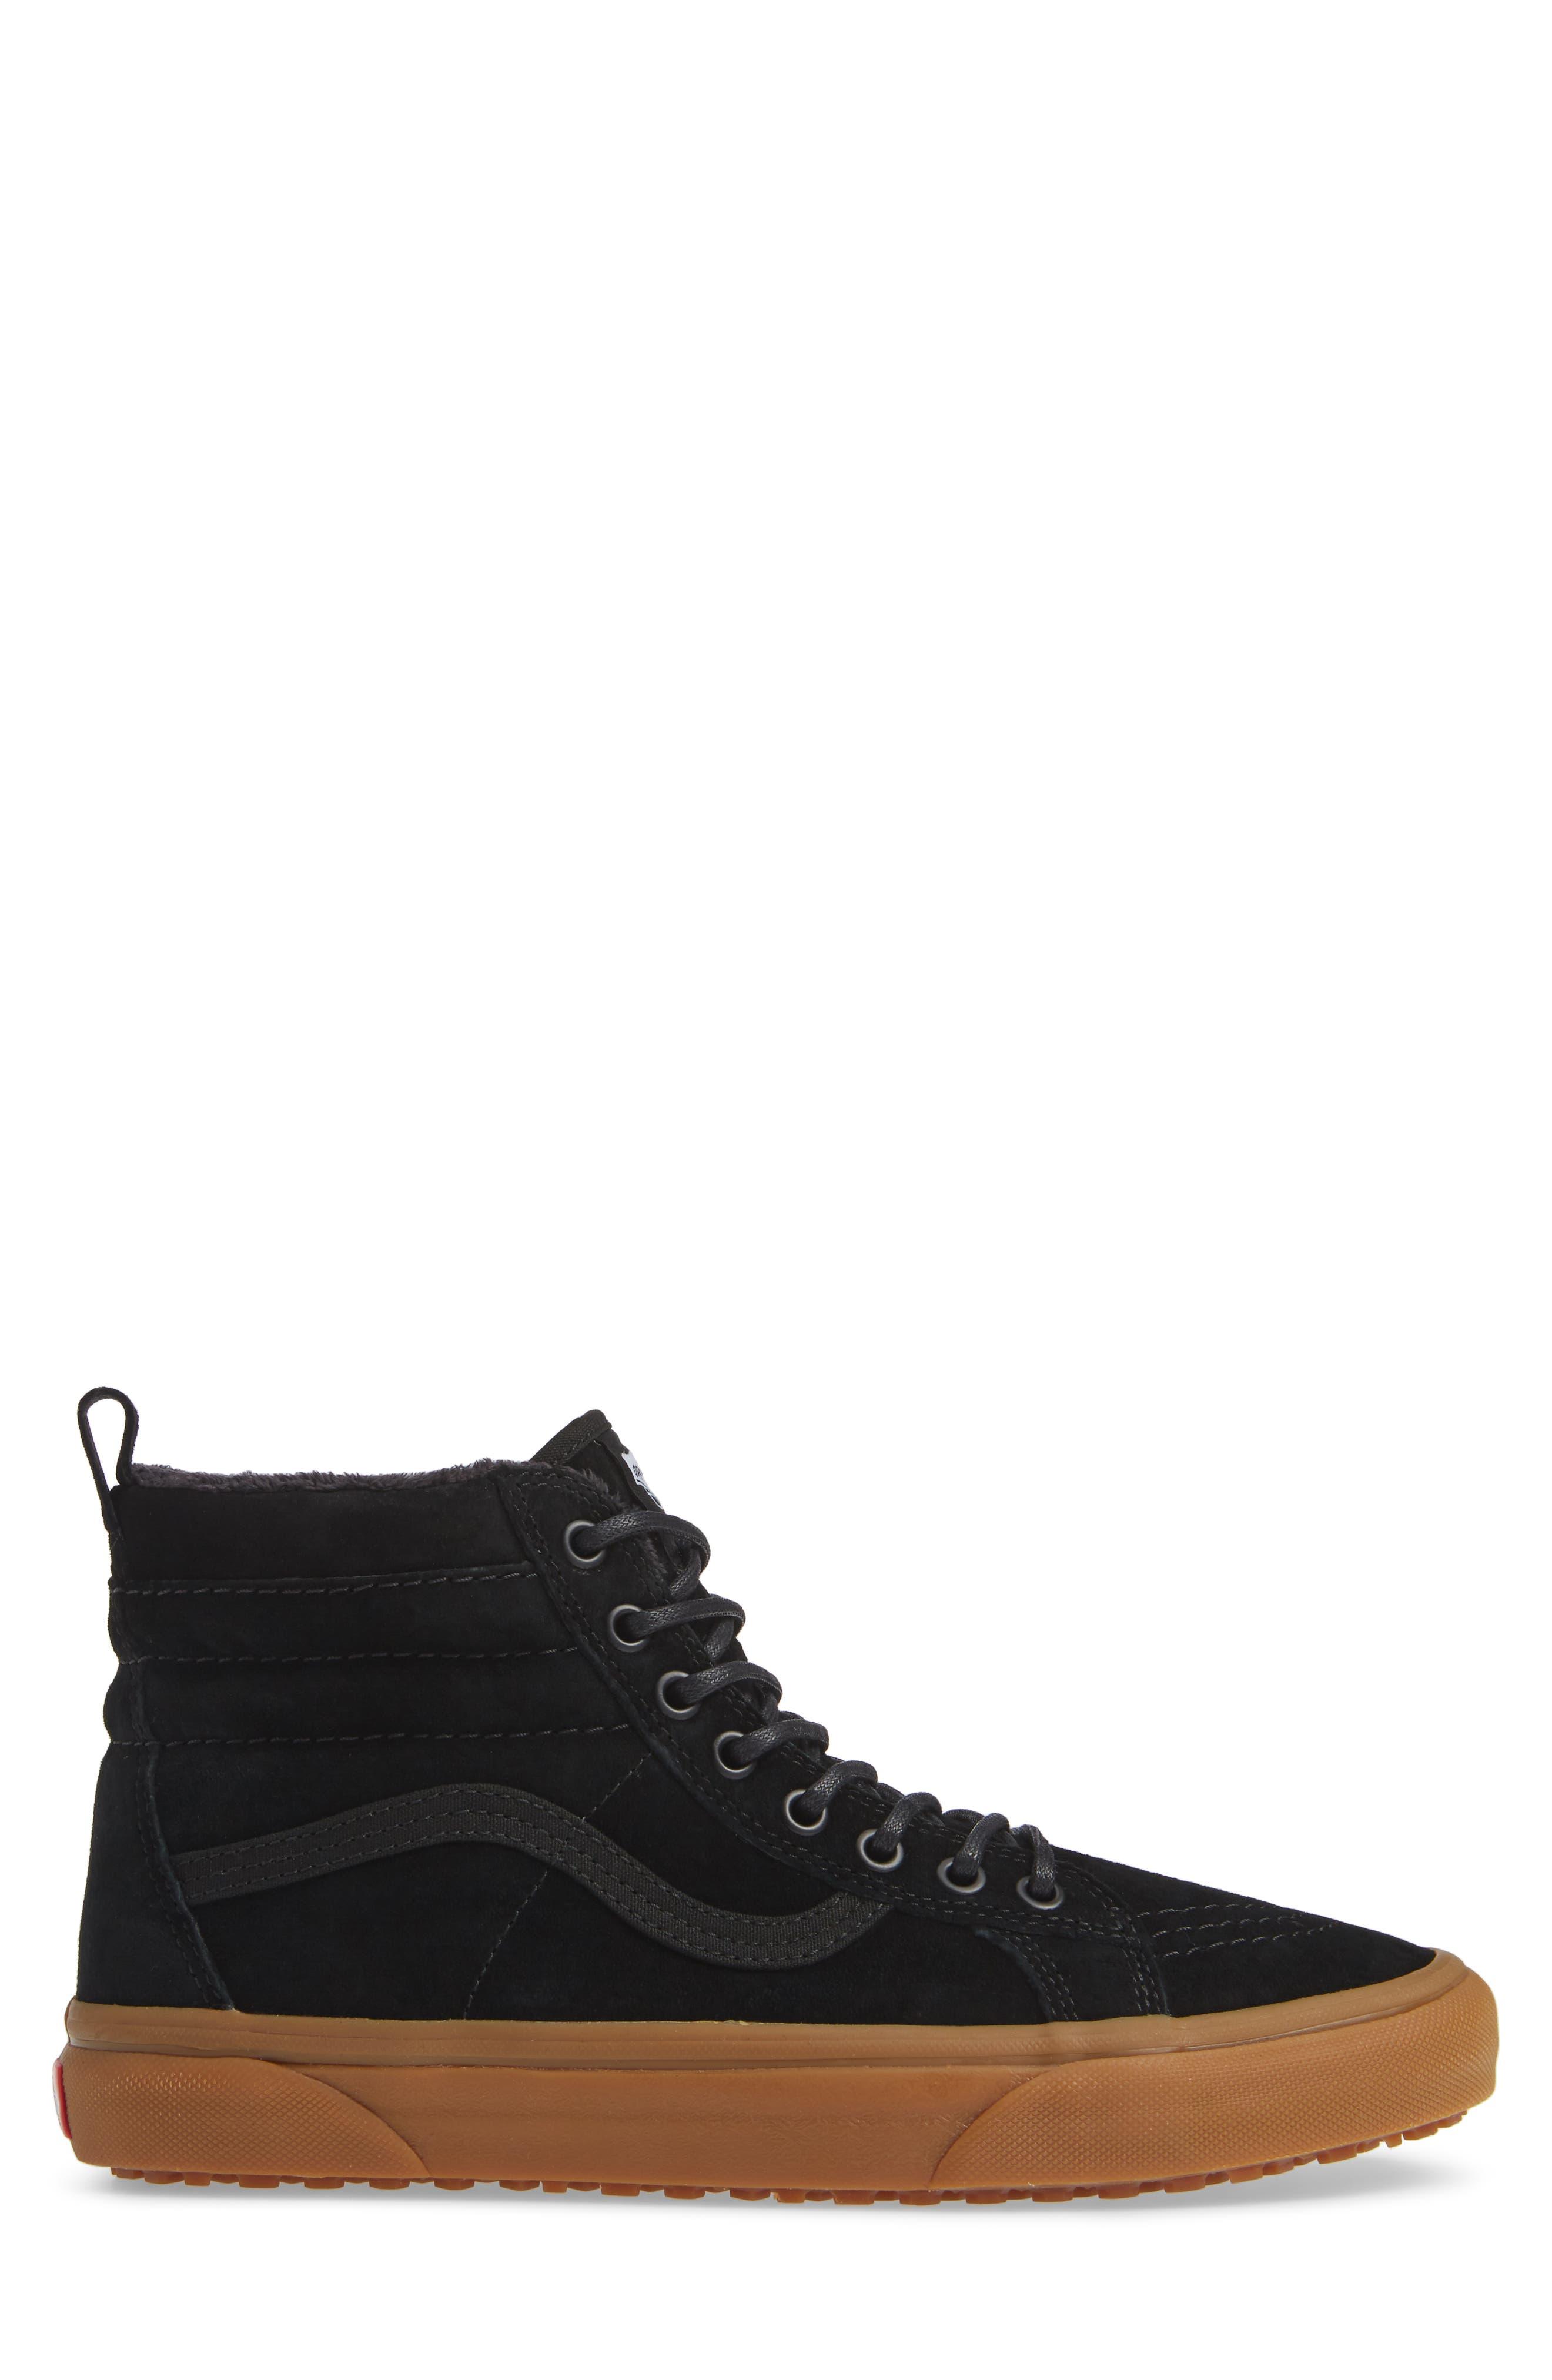 'Sk8-Hi MTE' Sneaker,                             Alternate thumbnail 3, color,                             BLACK/ GUM